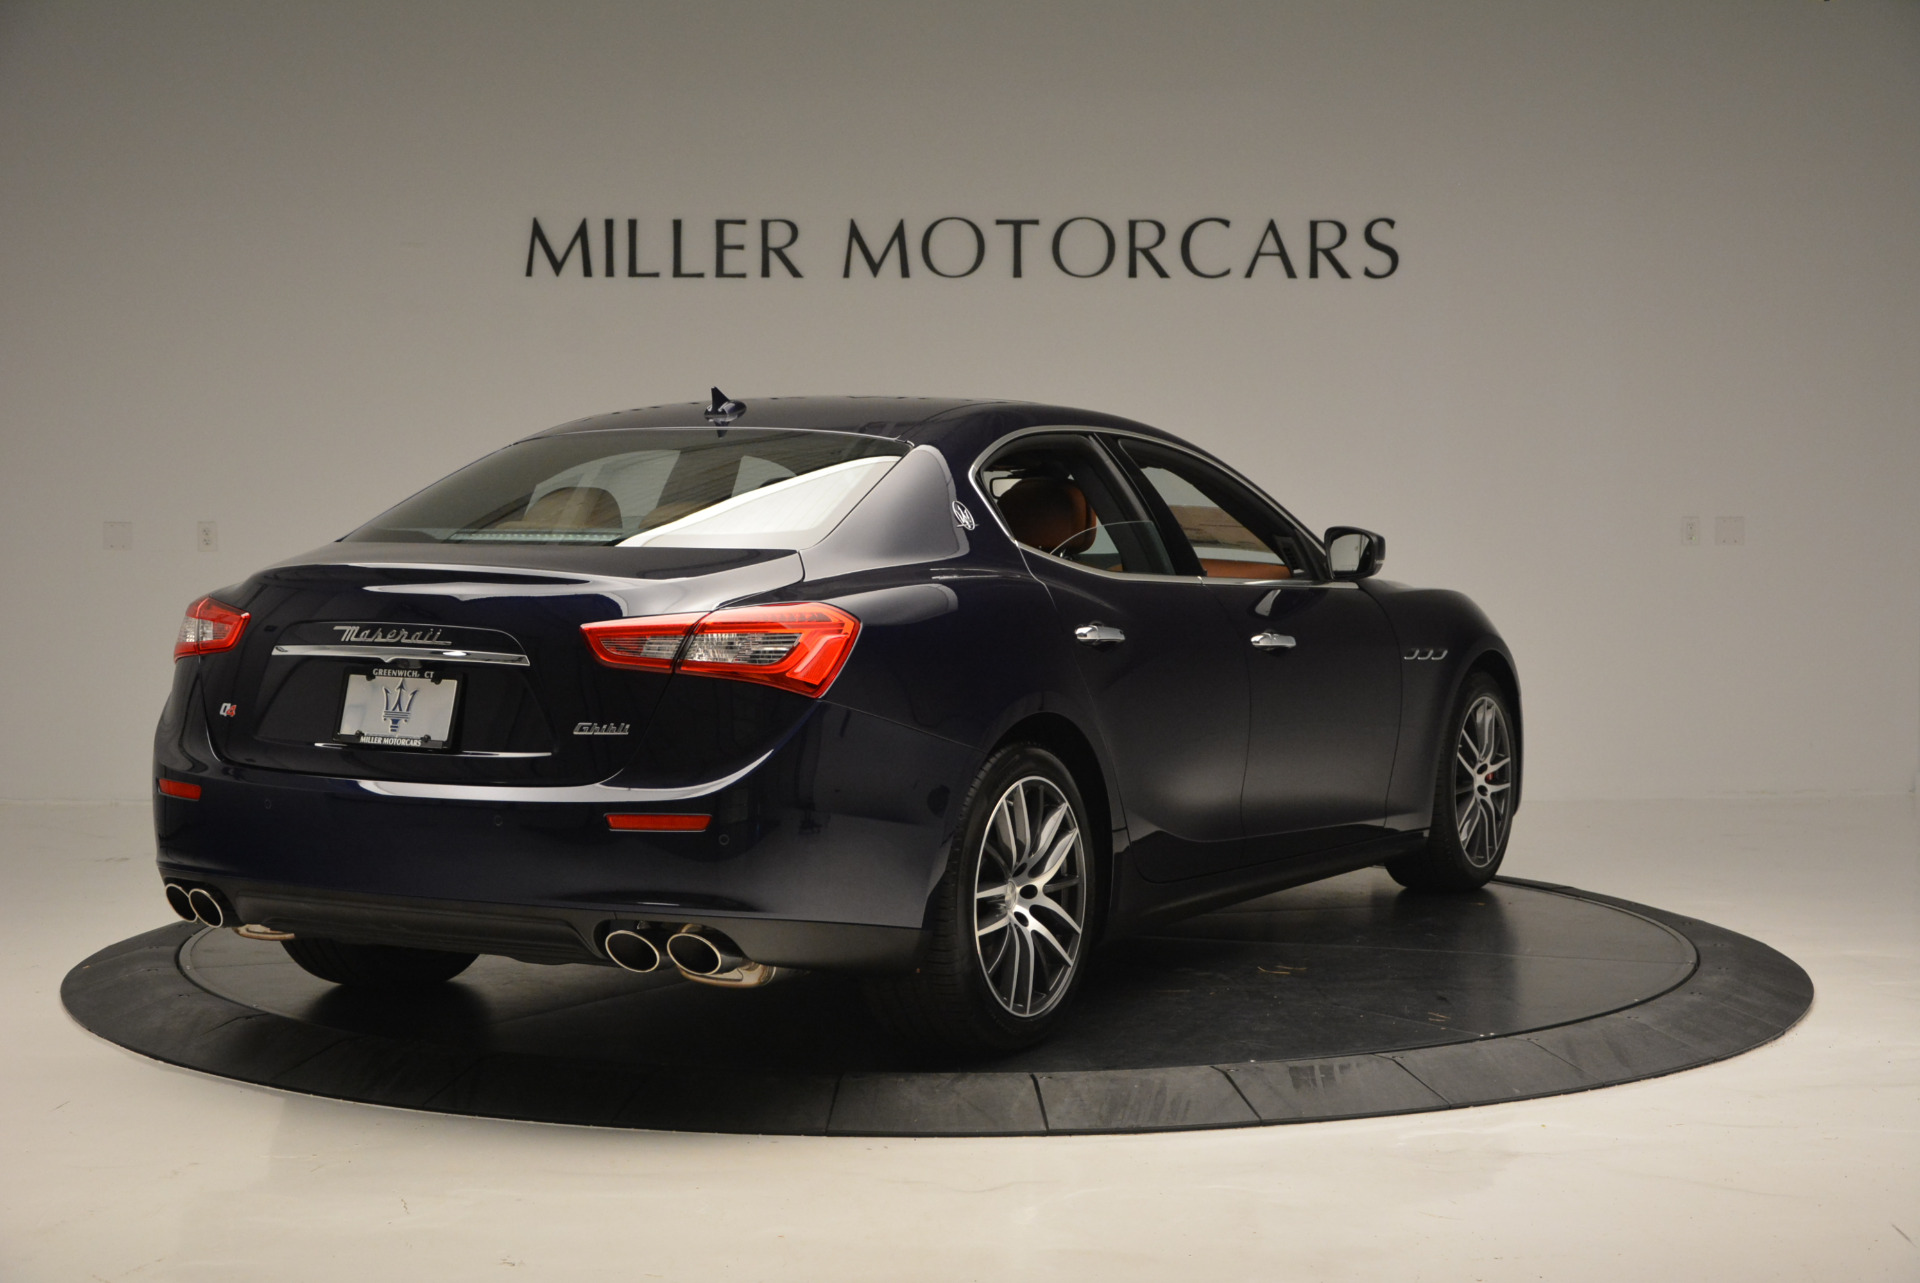 Used 2017 Maserati Ghibli S Q4 - EX Loaner For Sale In Greenwich, CT 567_p7